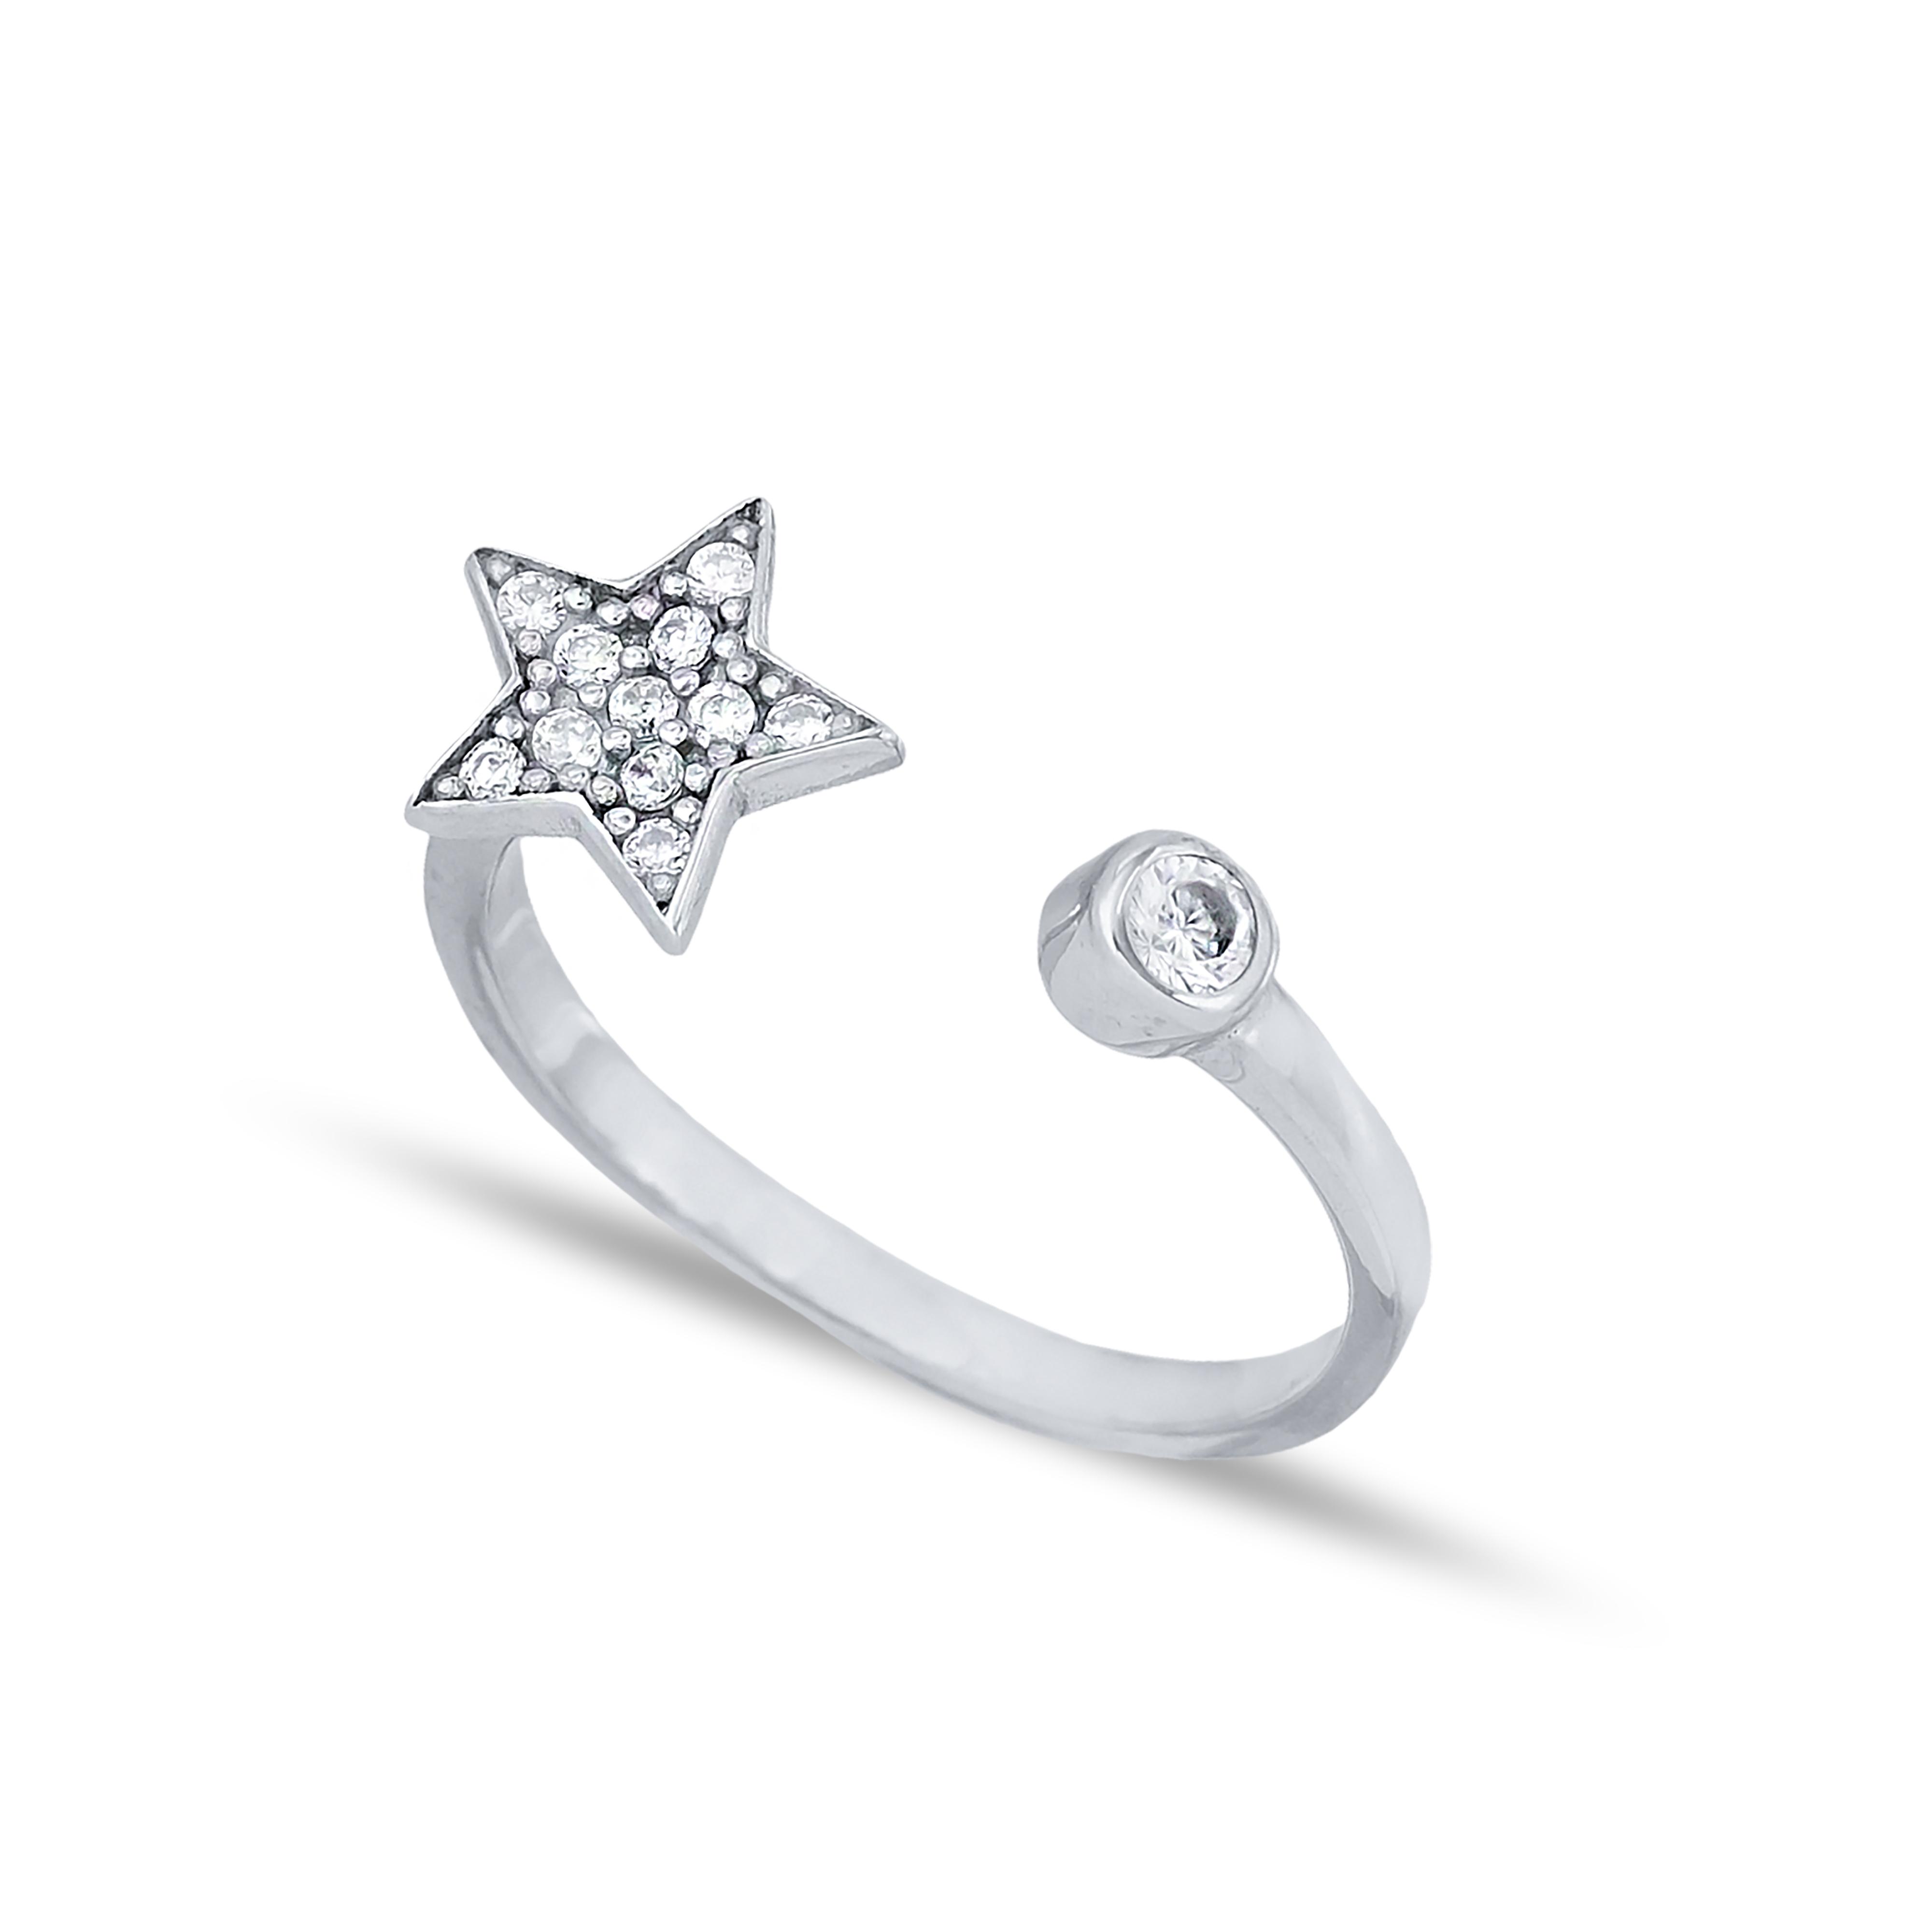 Star Design Zircon Stone Adjustable Ring Turkish Wholesale Handcrafted 925 Silver Jewelry